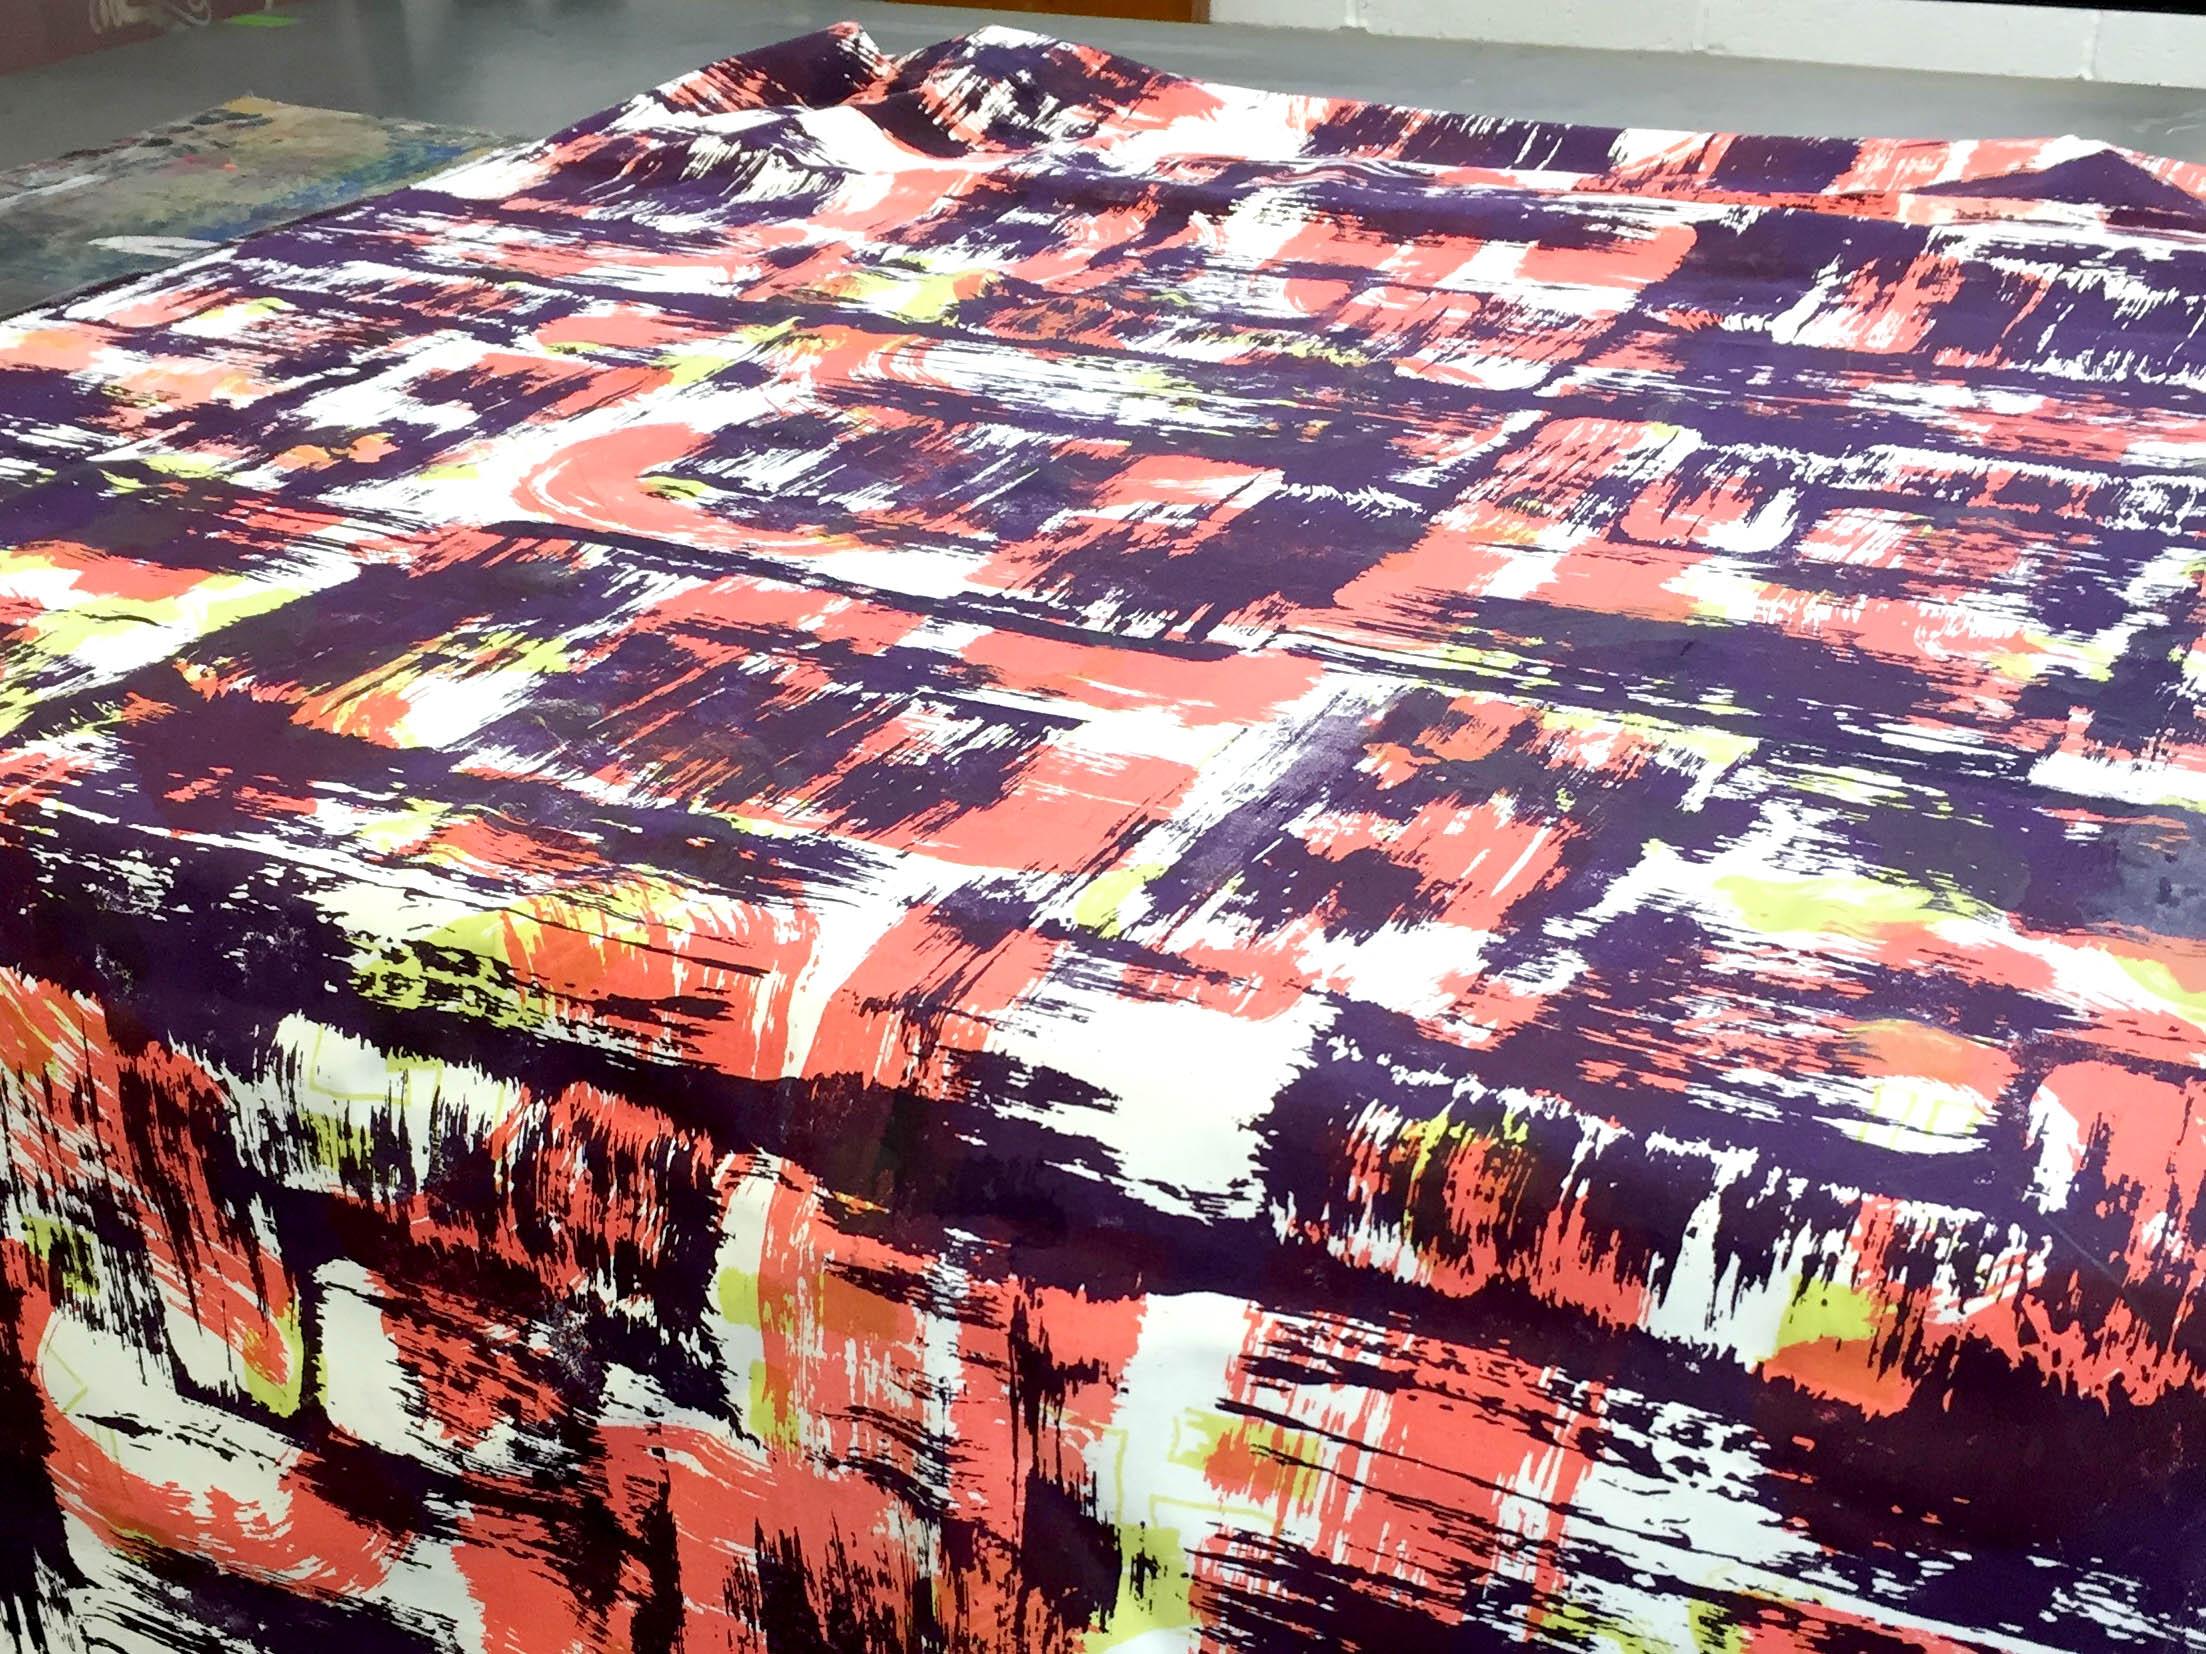 3m run of the three colour print onto cotton